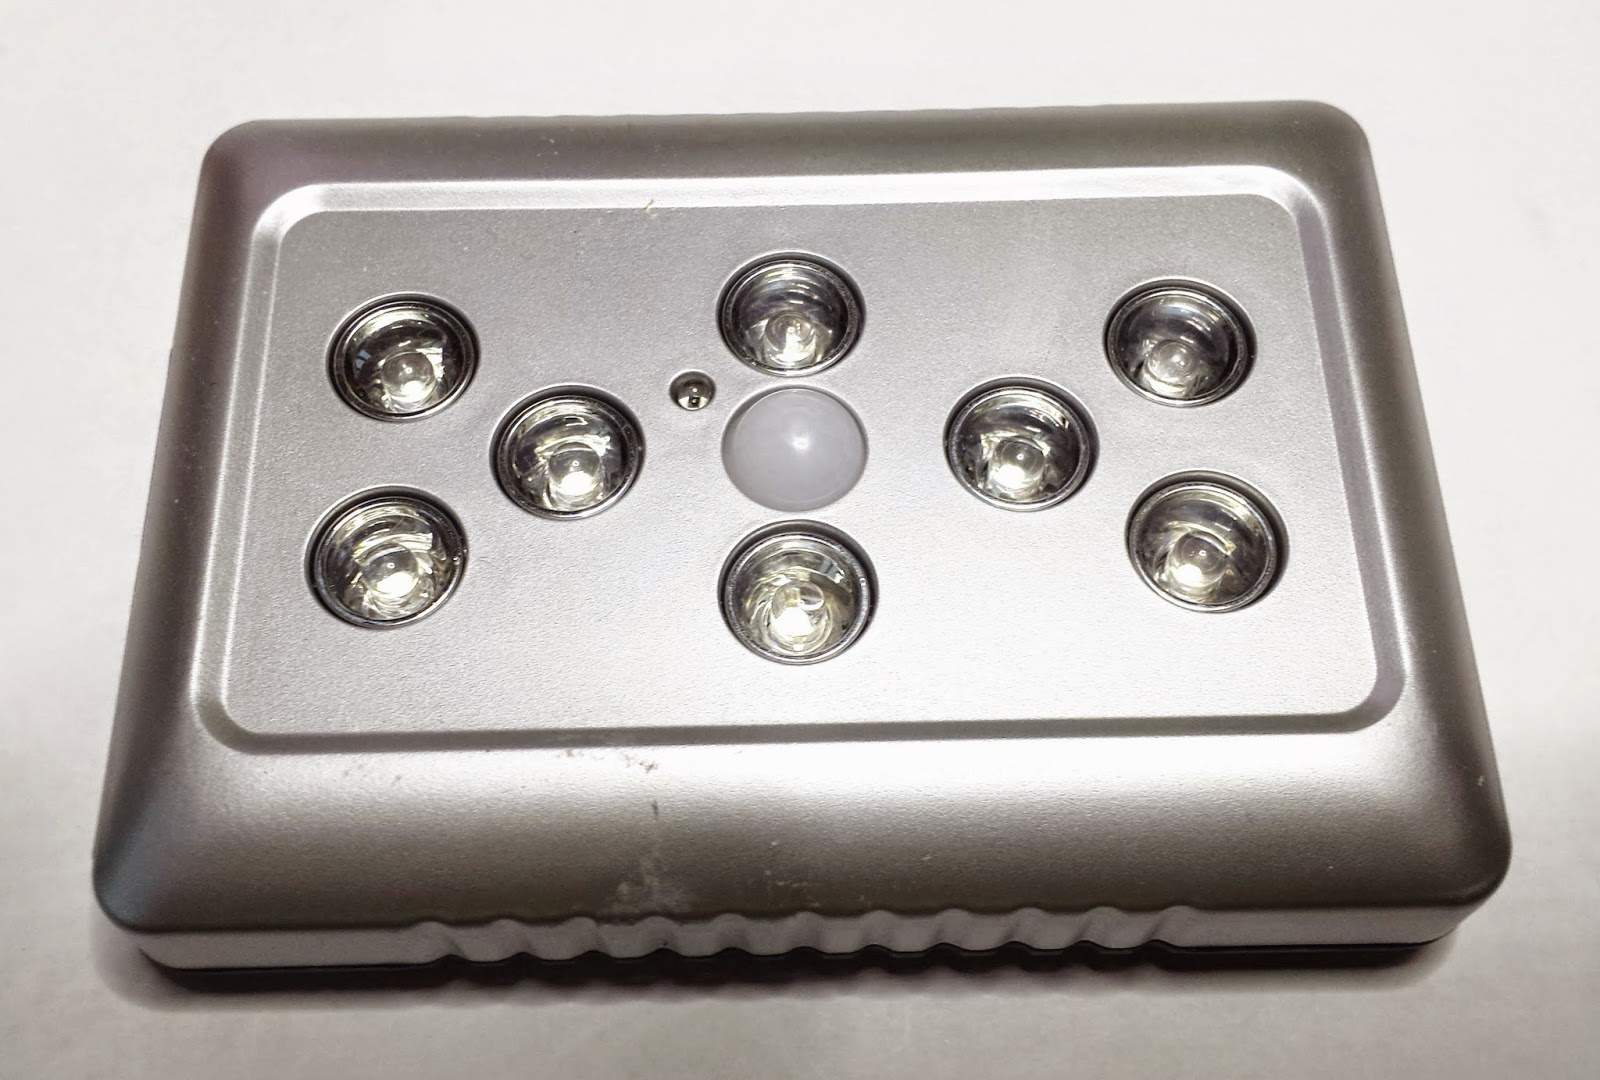 Random Tech Stuff Lidl Pir Nightlight Teardown And Hack Arduino Night Security Alarm With Sensor